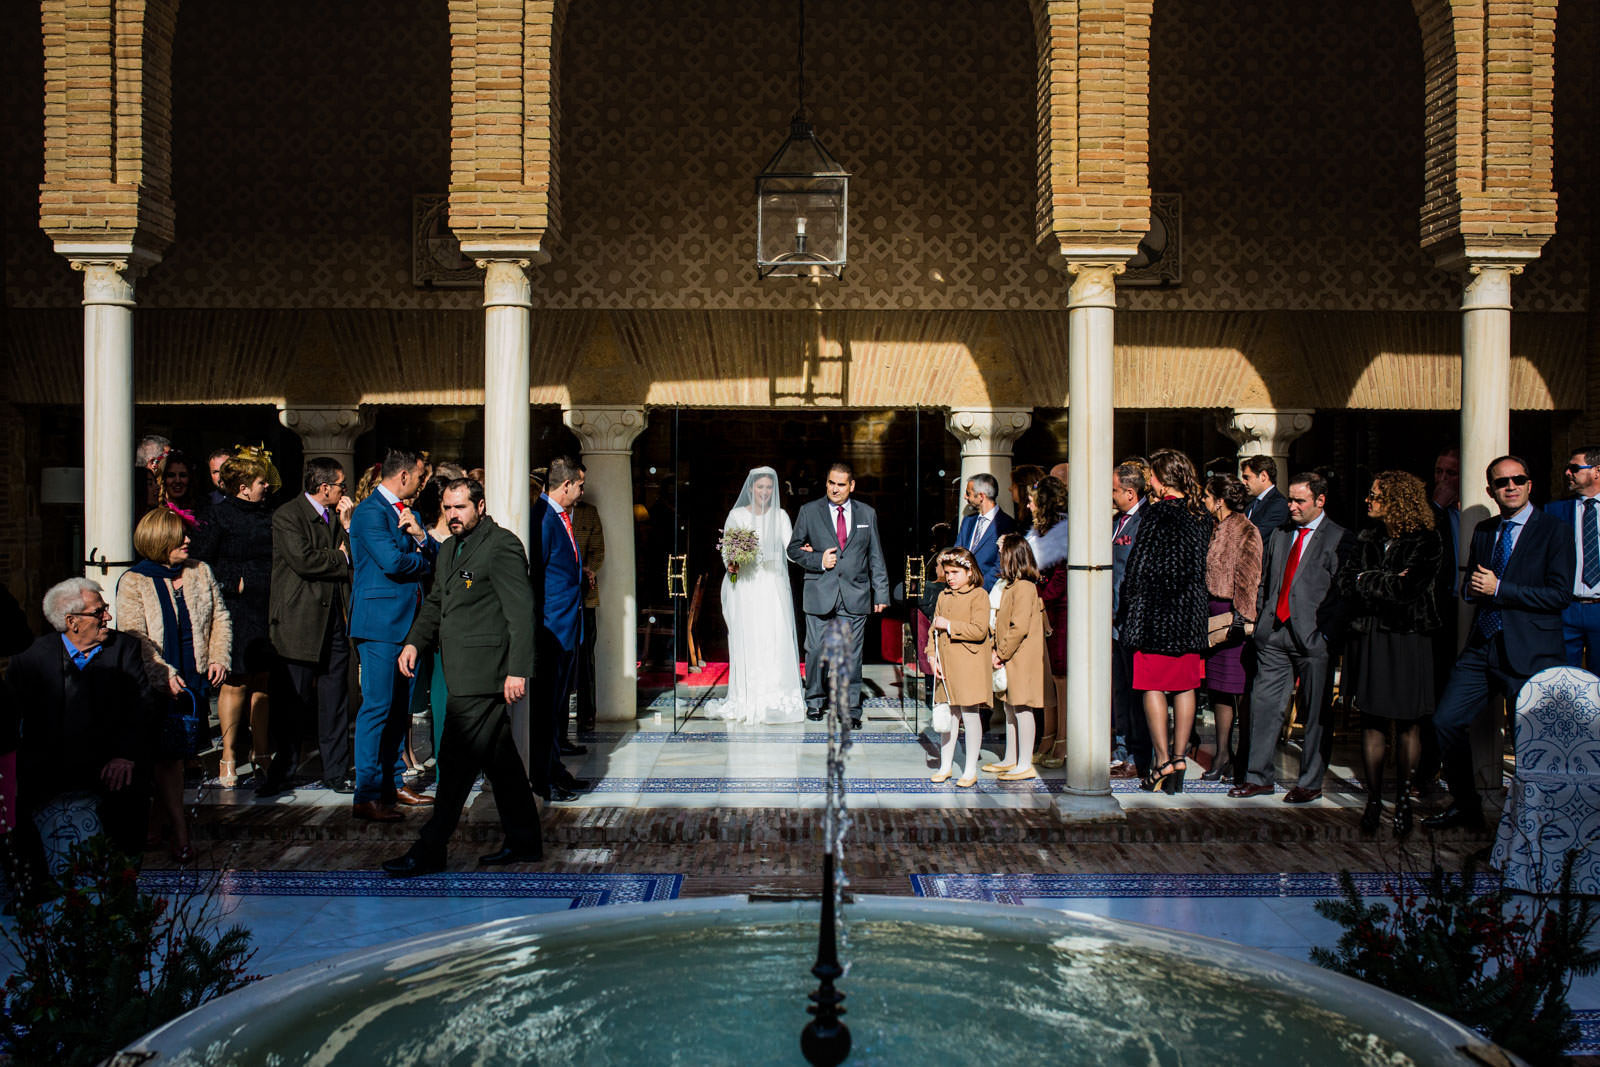 Boda-Sevilla-Parador-Carmona-bridal-engagement-Rafael-Torres-fotografo-bodas-sevilla-madrid-barcelona-wedding-photographer--34.jpg